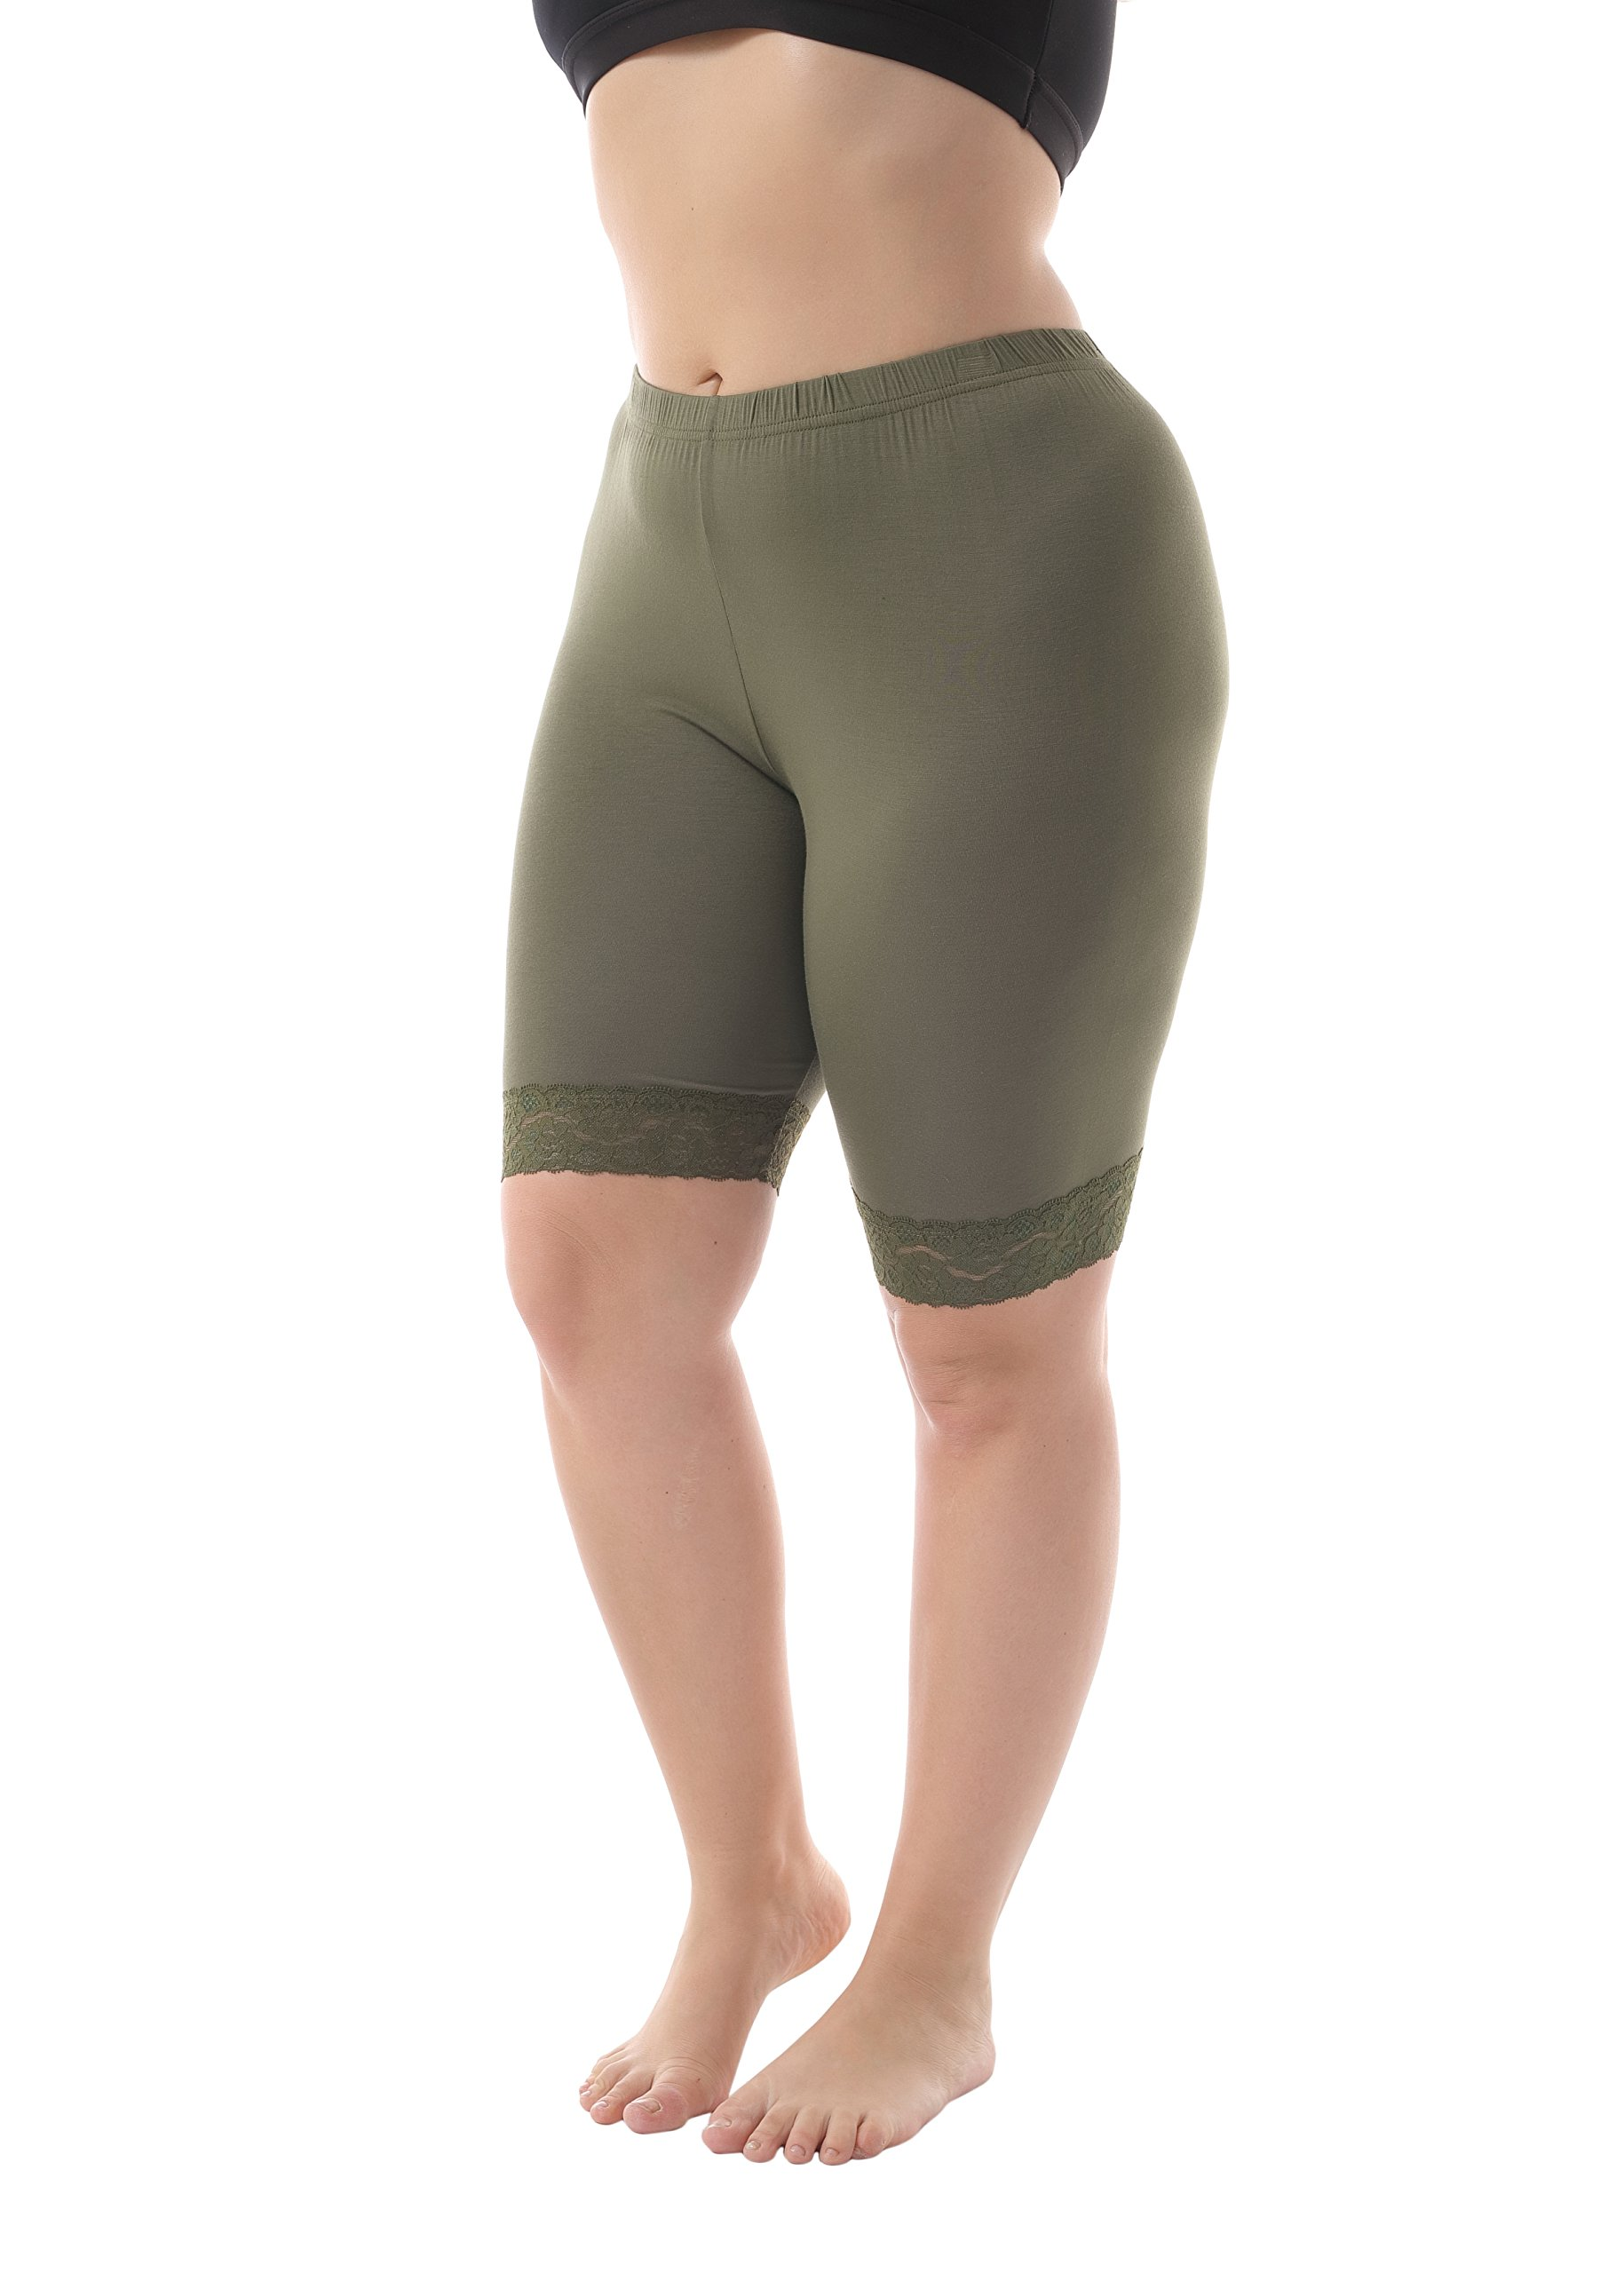 ZERDOCEAN Women's Plus Size Short Leggings with Lace Trim Army Green 2X Shorts